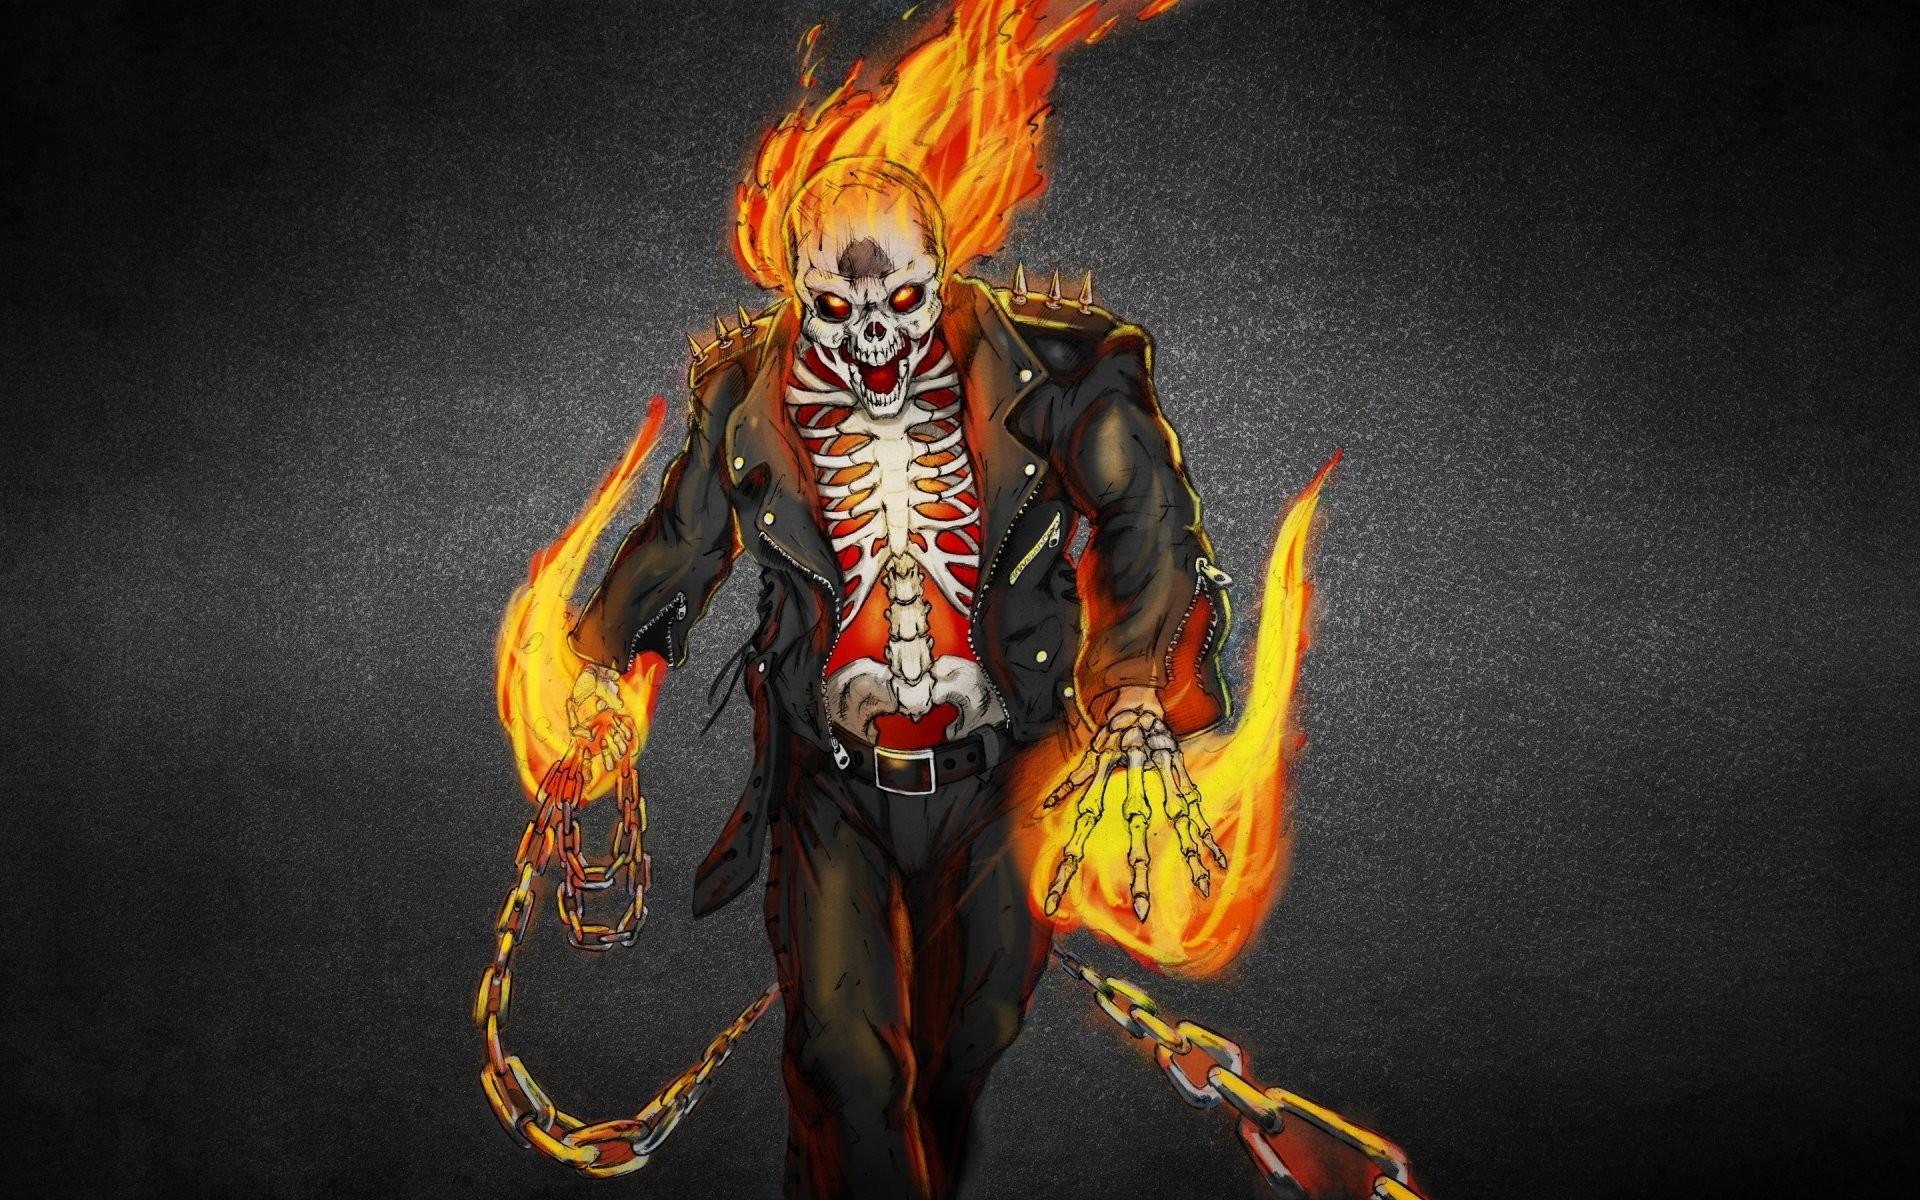 2048x1152 Download Wallpaper Ghost Rider Skull Fire